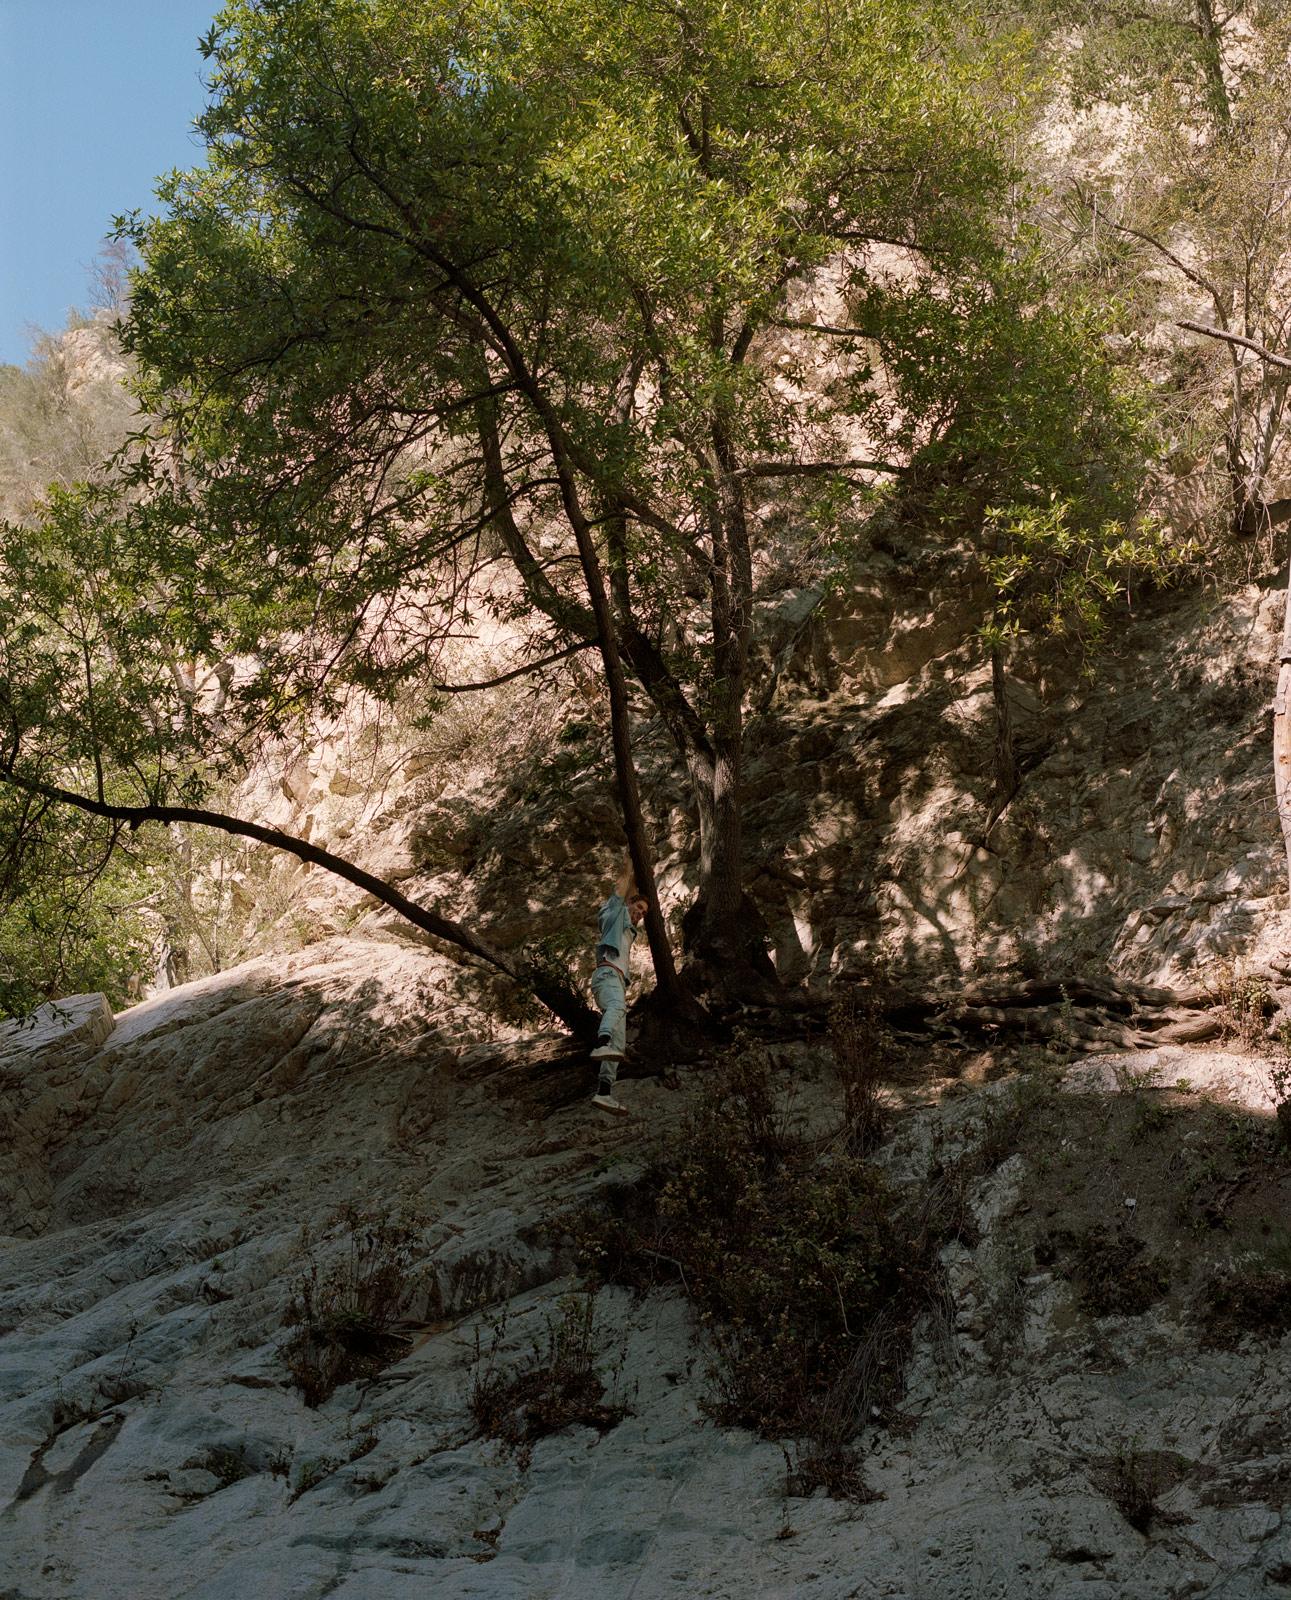 The Road To Switzer Falls, Photography By Ioannis Koussertari 5 friends journey to Switzer Falls California, featuring Shayne Davis.